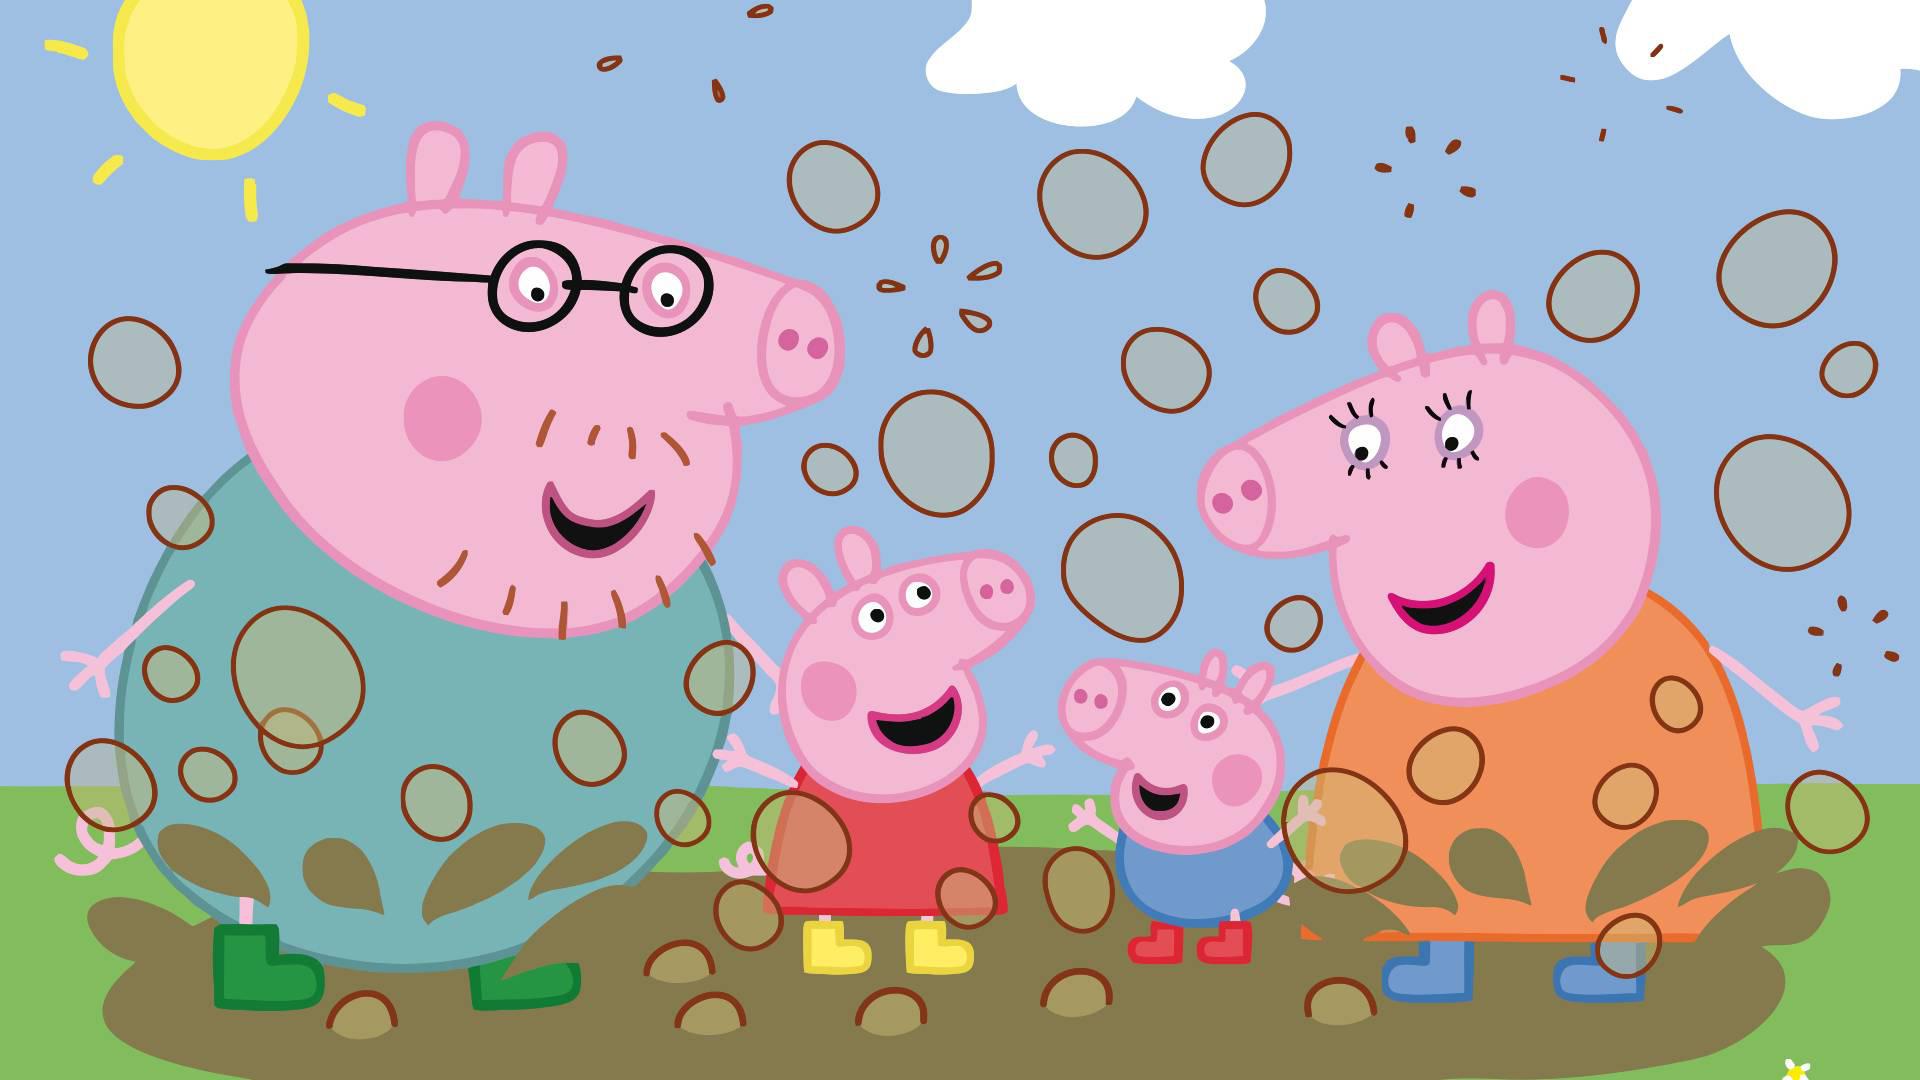 fondos peppa pig  wallpapers peppa pig cute pig clip art for girl cute pig clipart